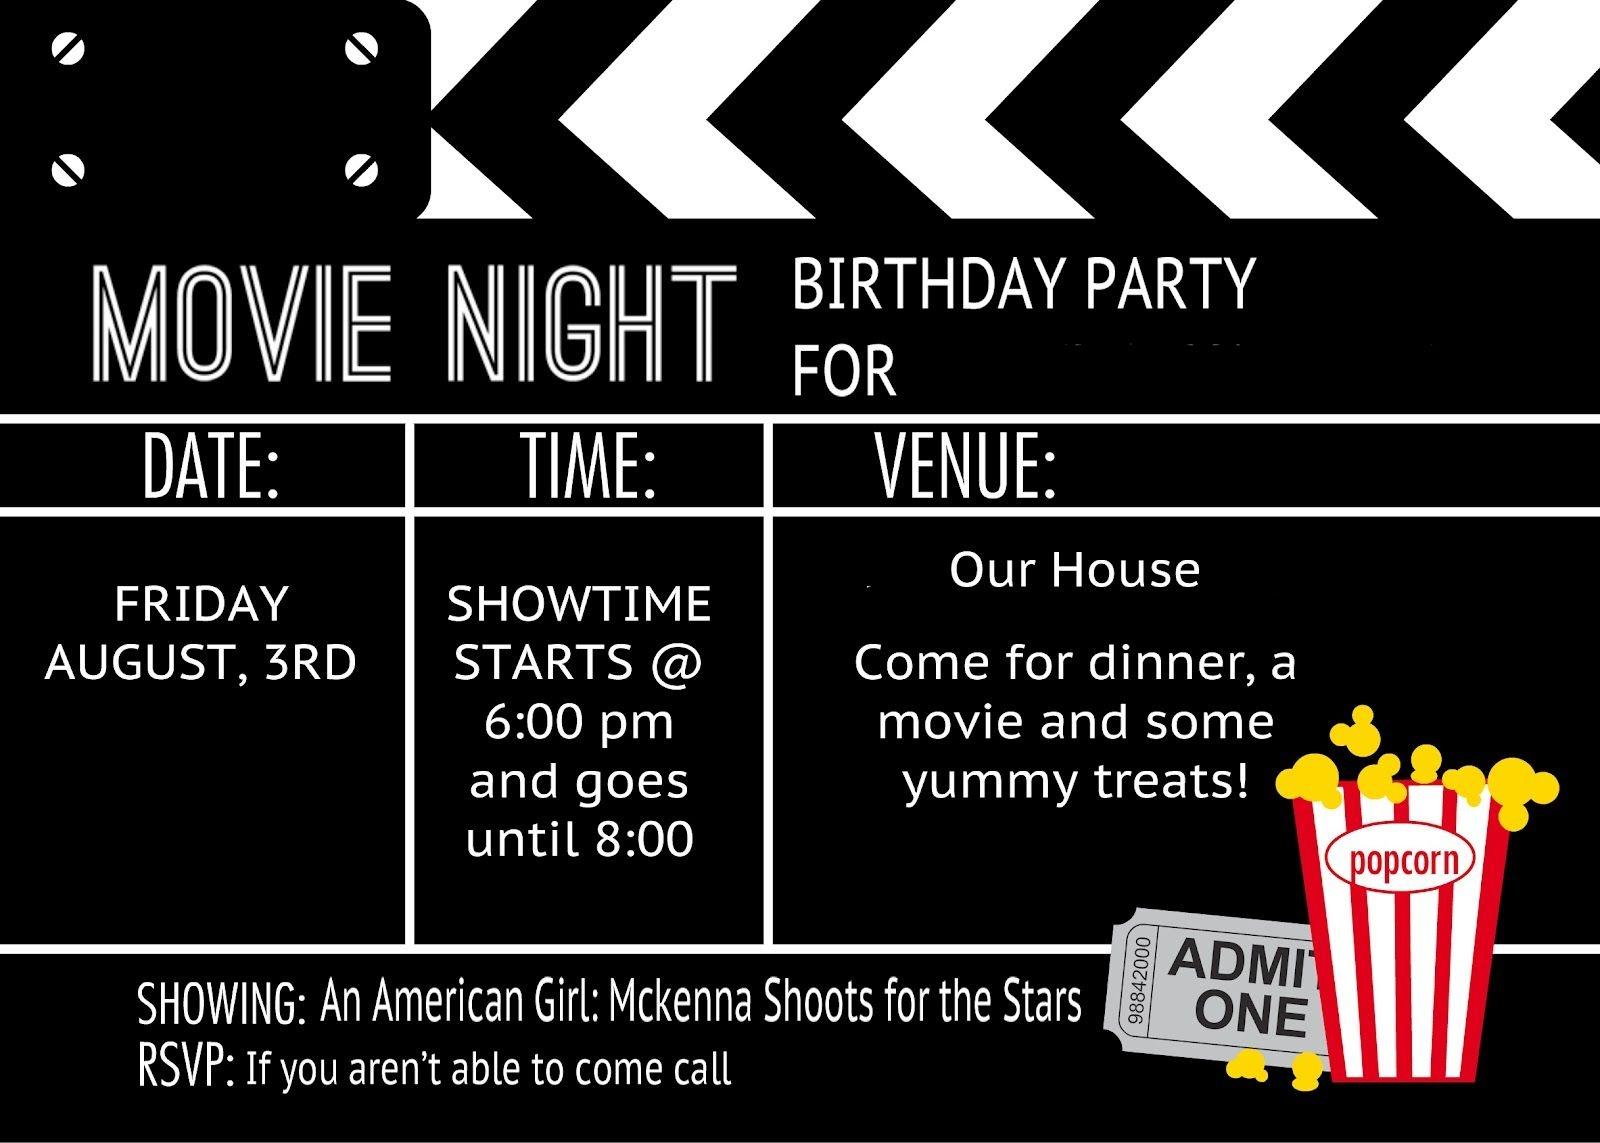 Birthday Party Invitation Templates Movie Theme | Kalli's 13Th - Free Printable Movie Themed Invitations